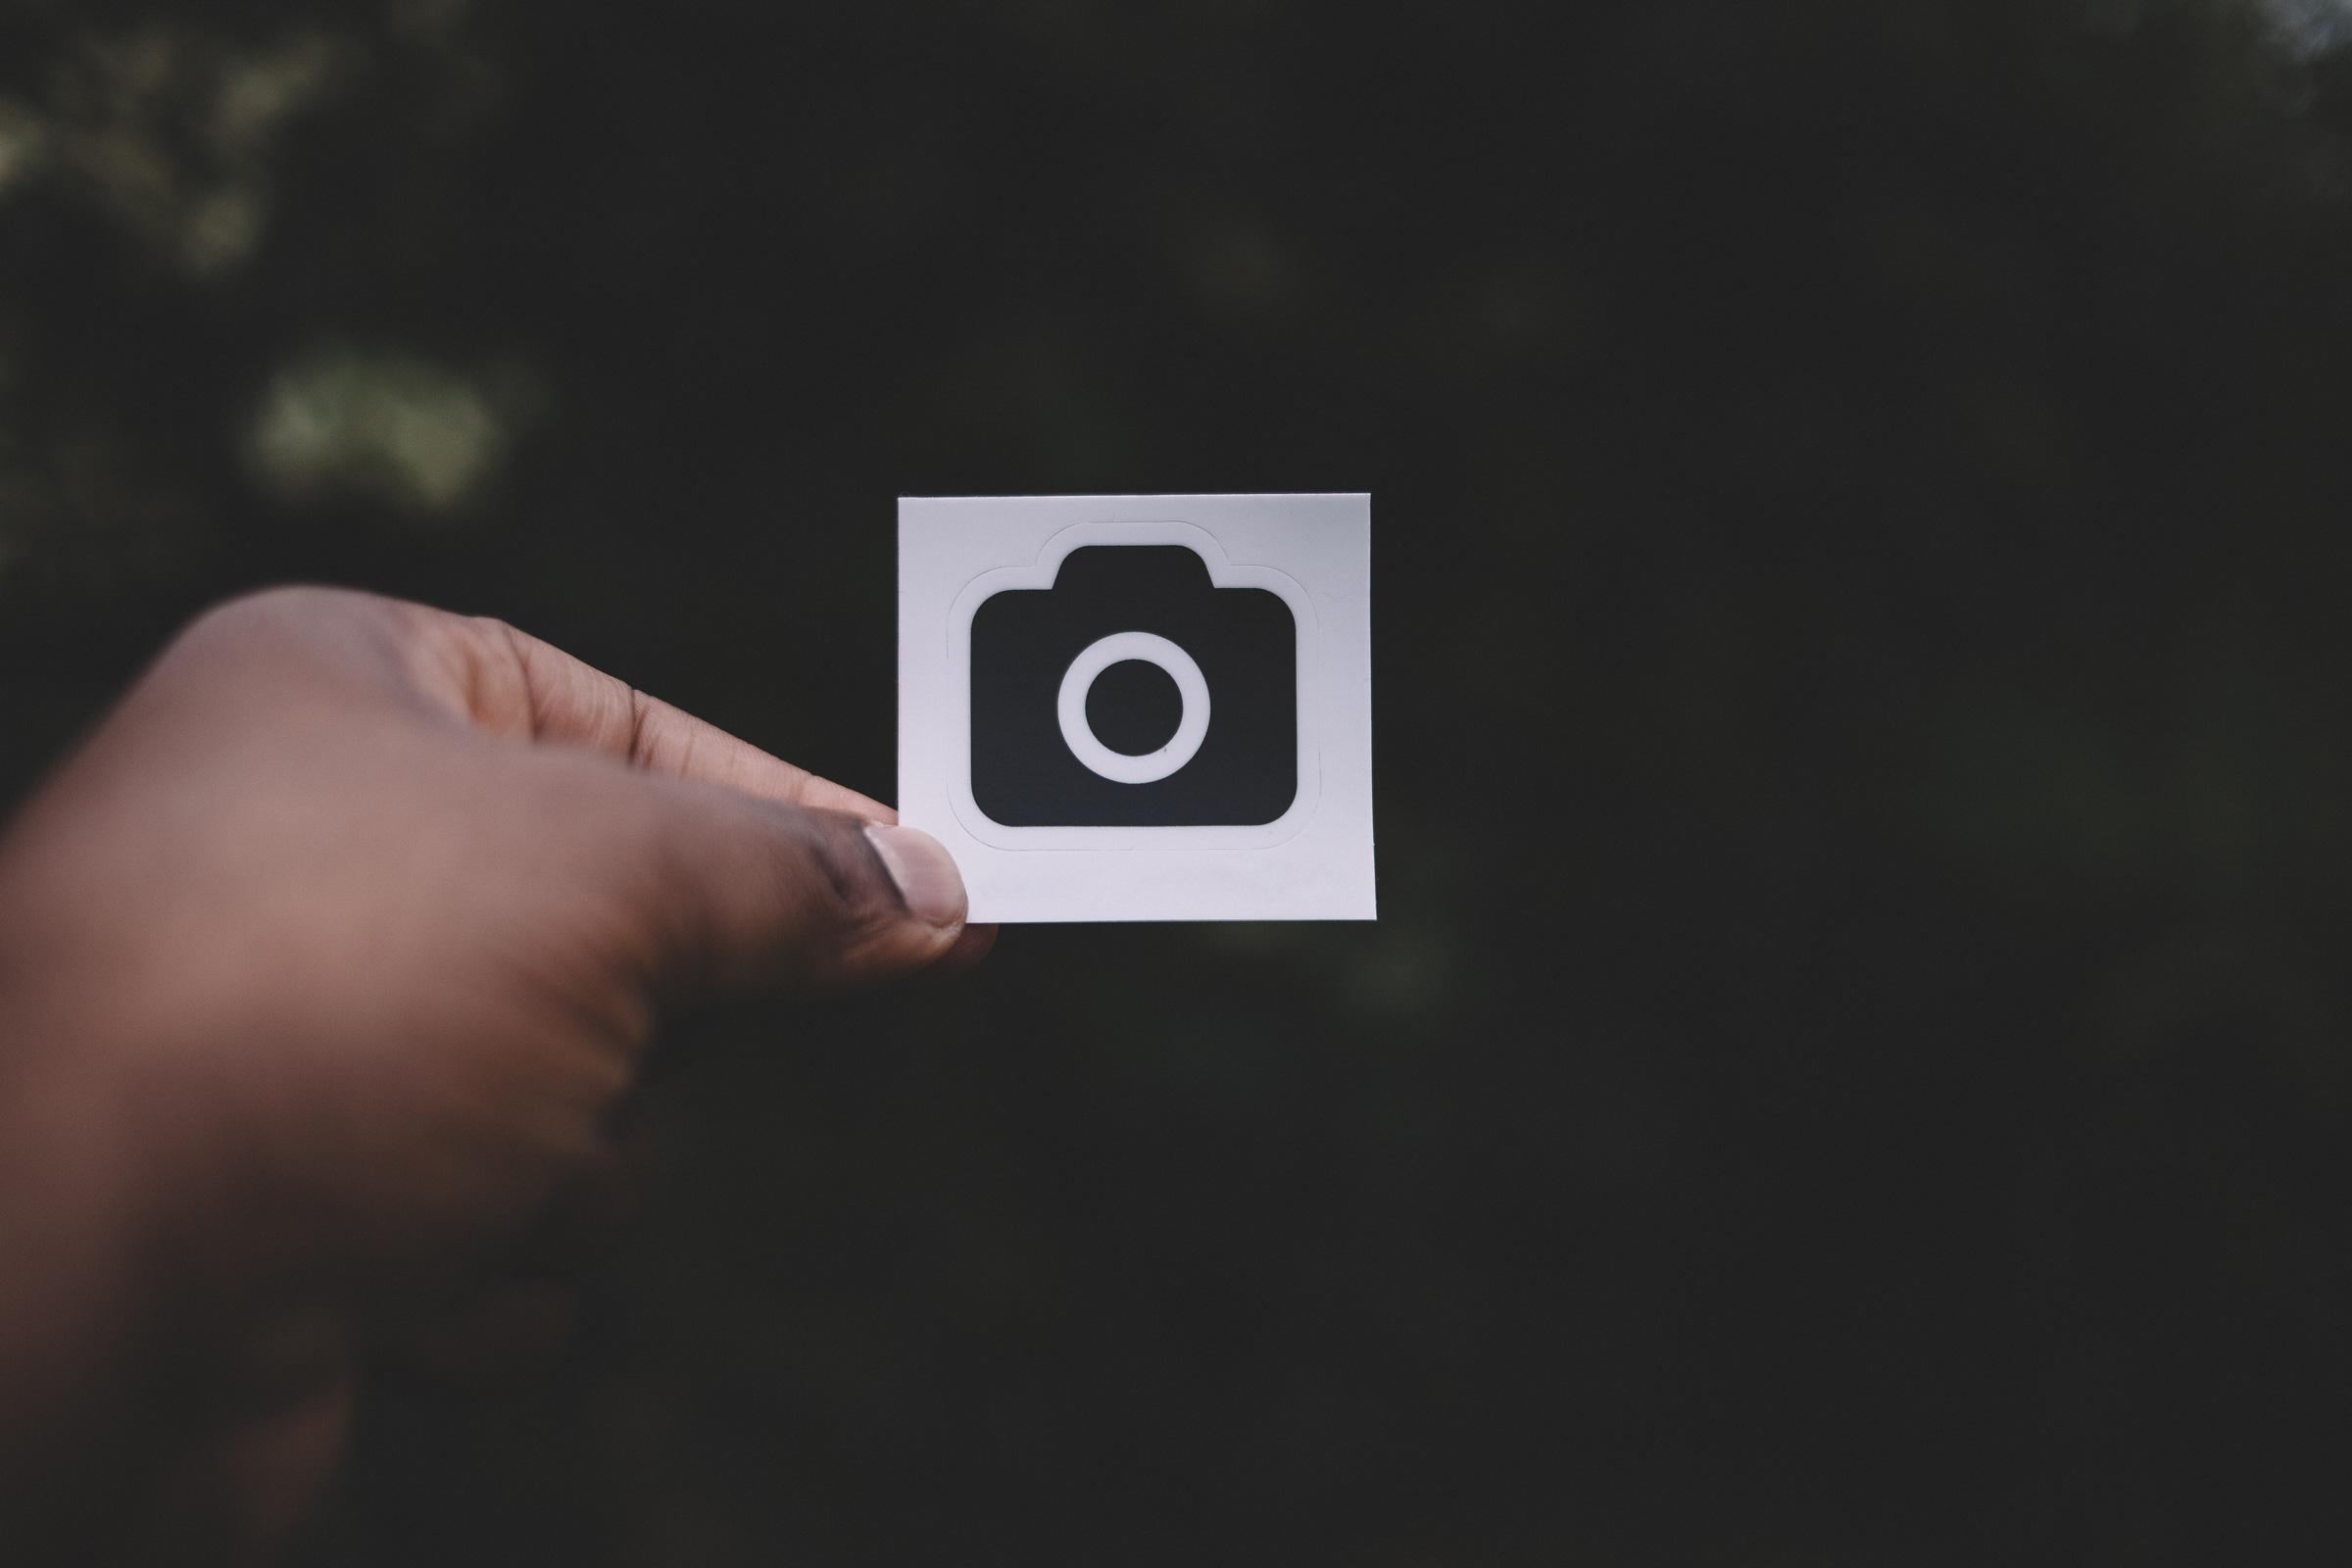 free stock photo sites